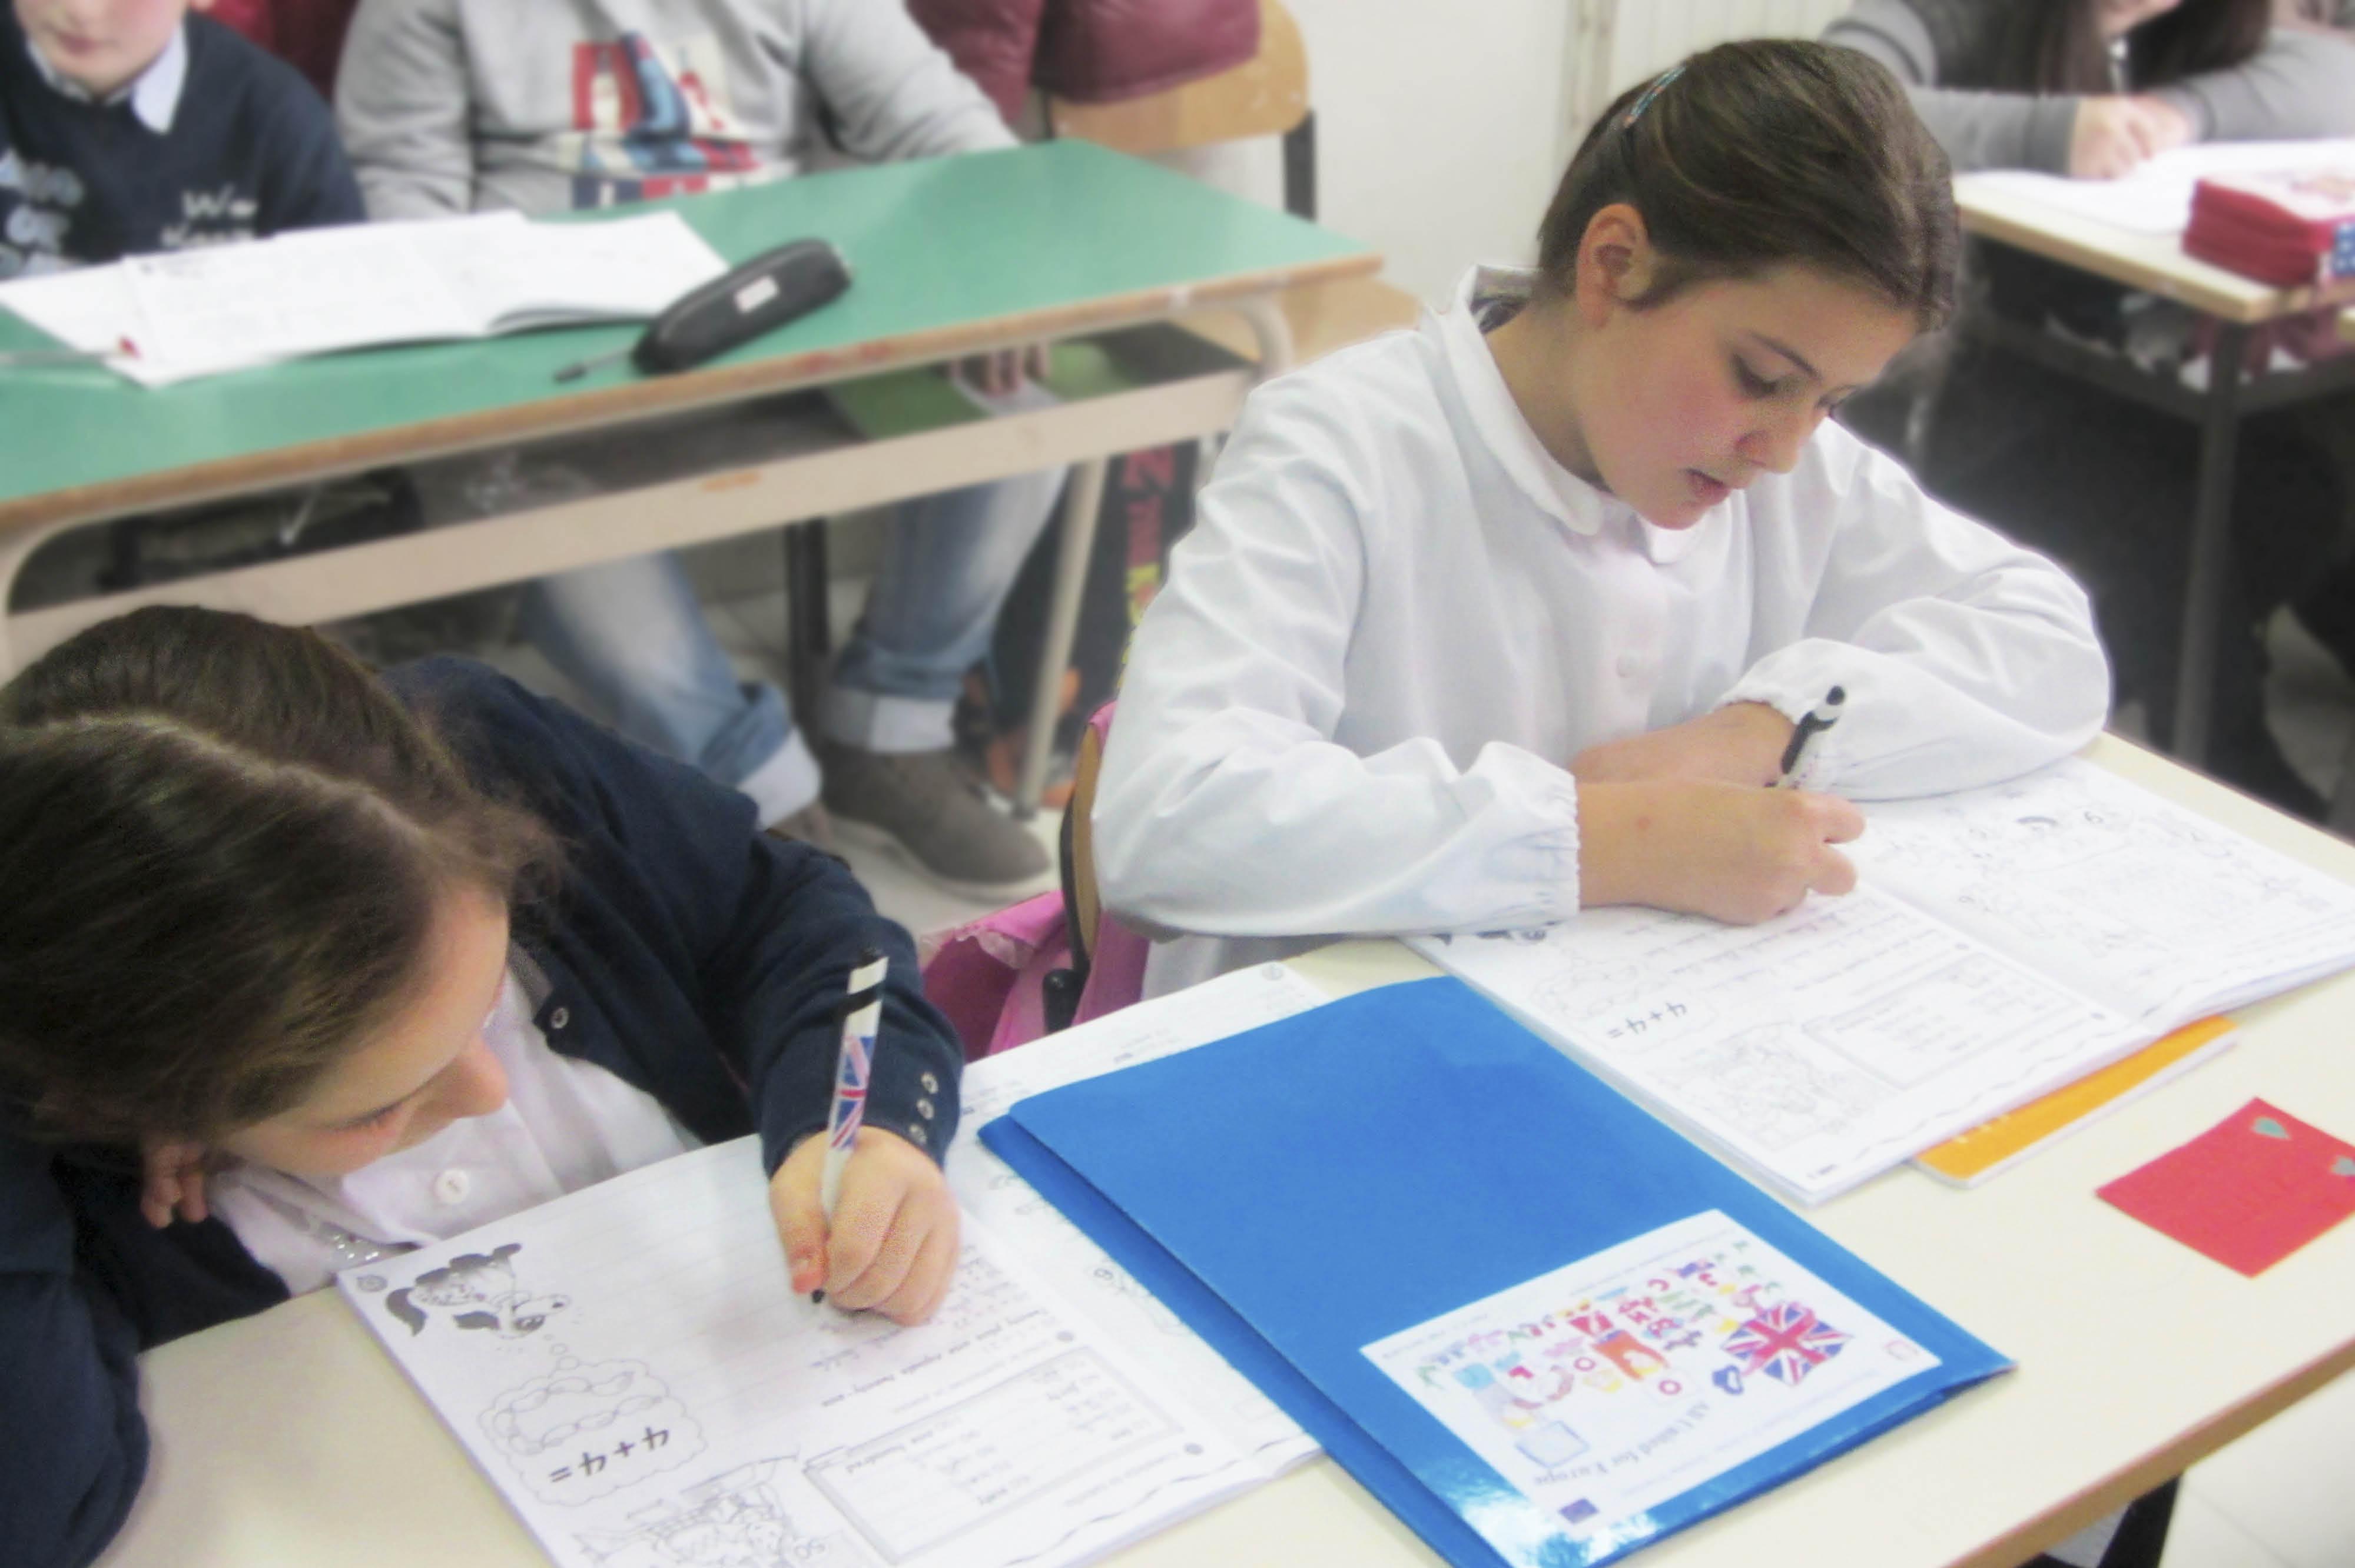 Benedict School Pomigliano d'Arco @ Somma9